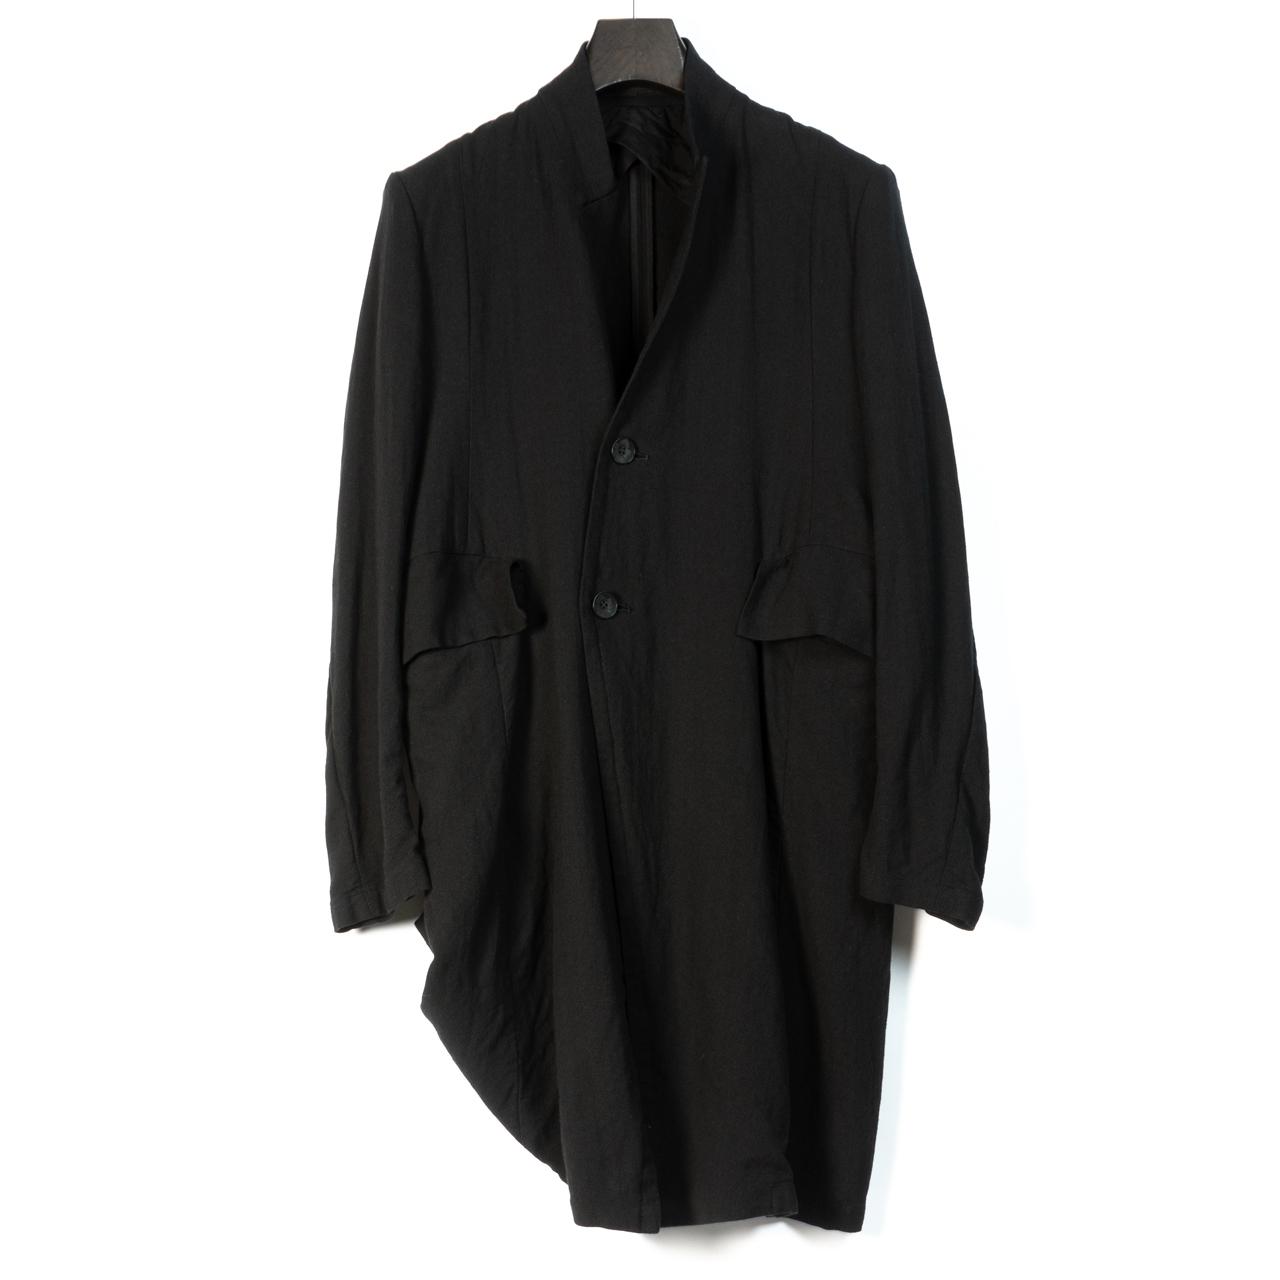 697JAM2-BLACK / スタンドカラーテーラードジャケット